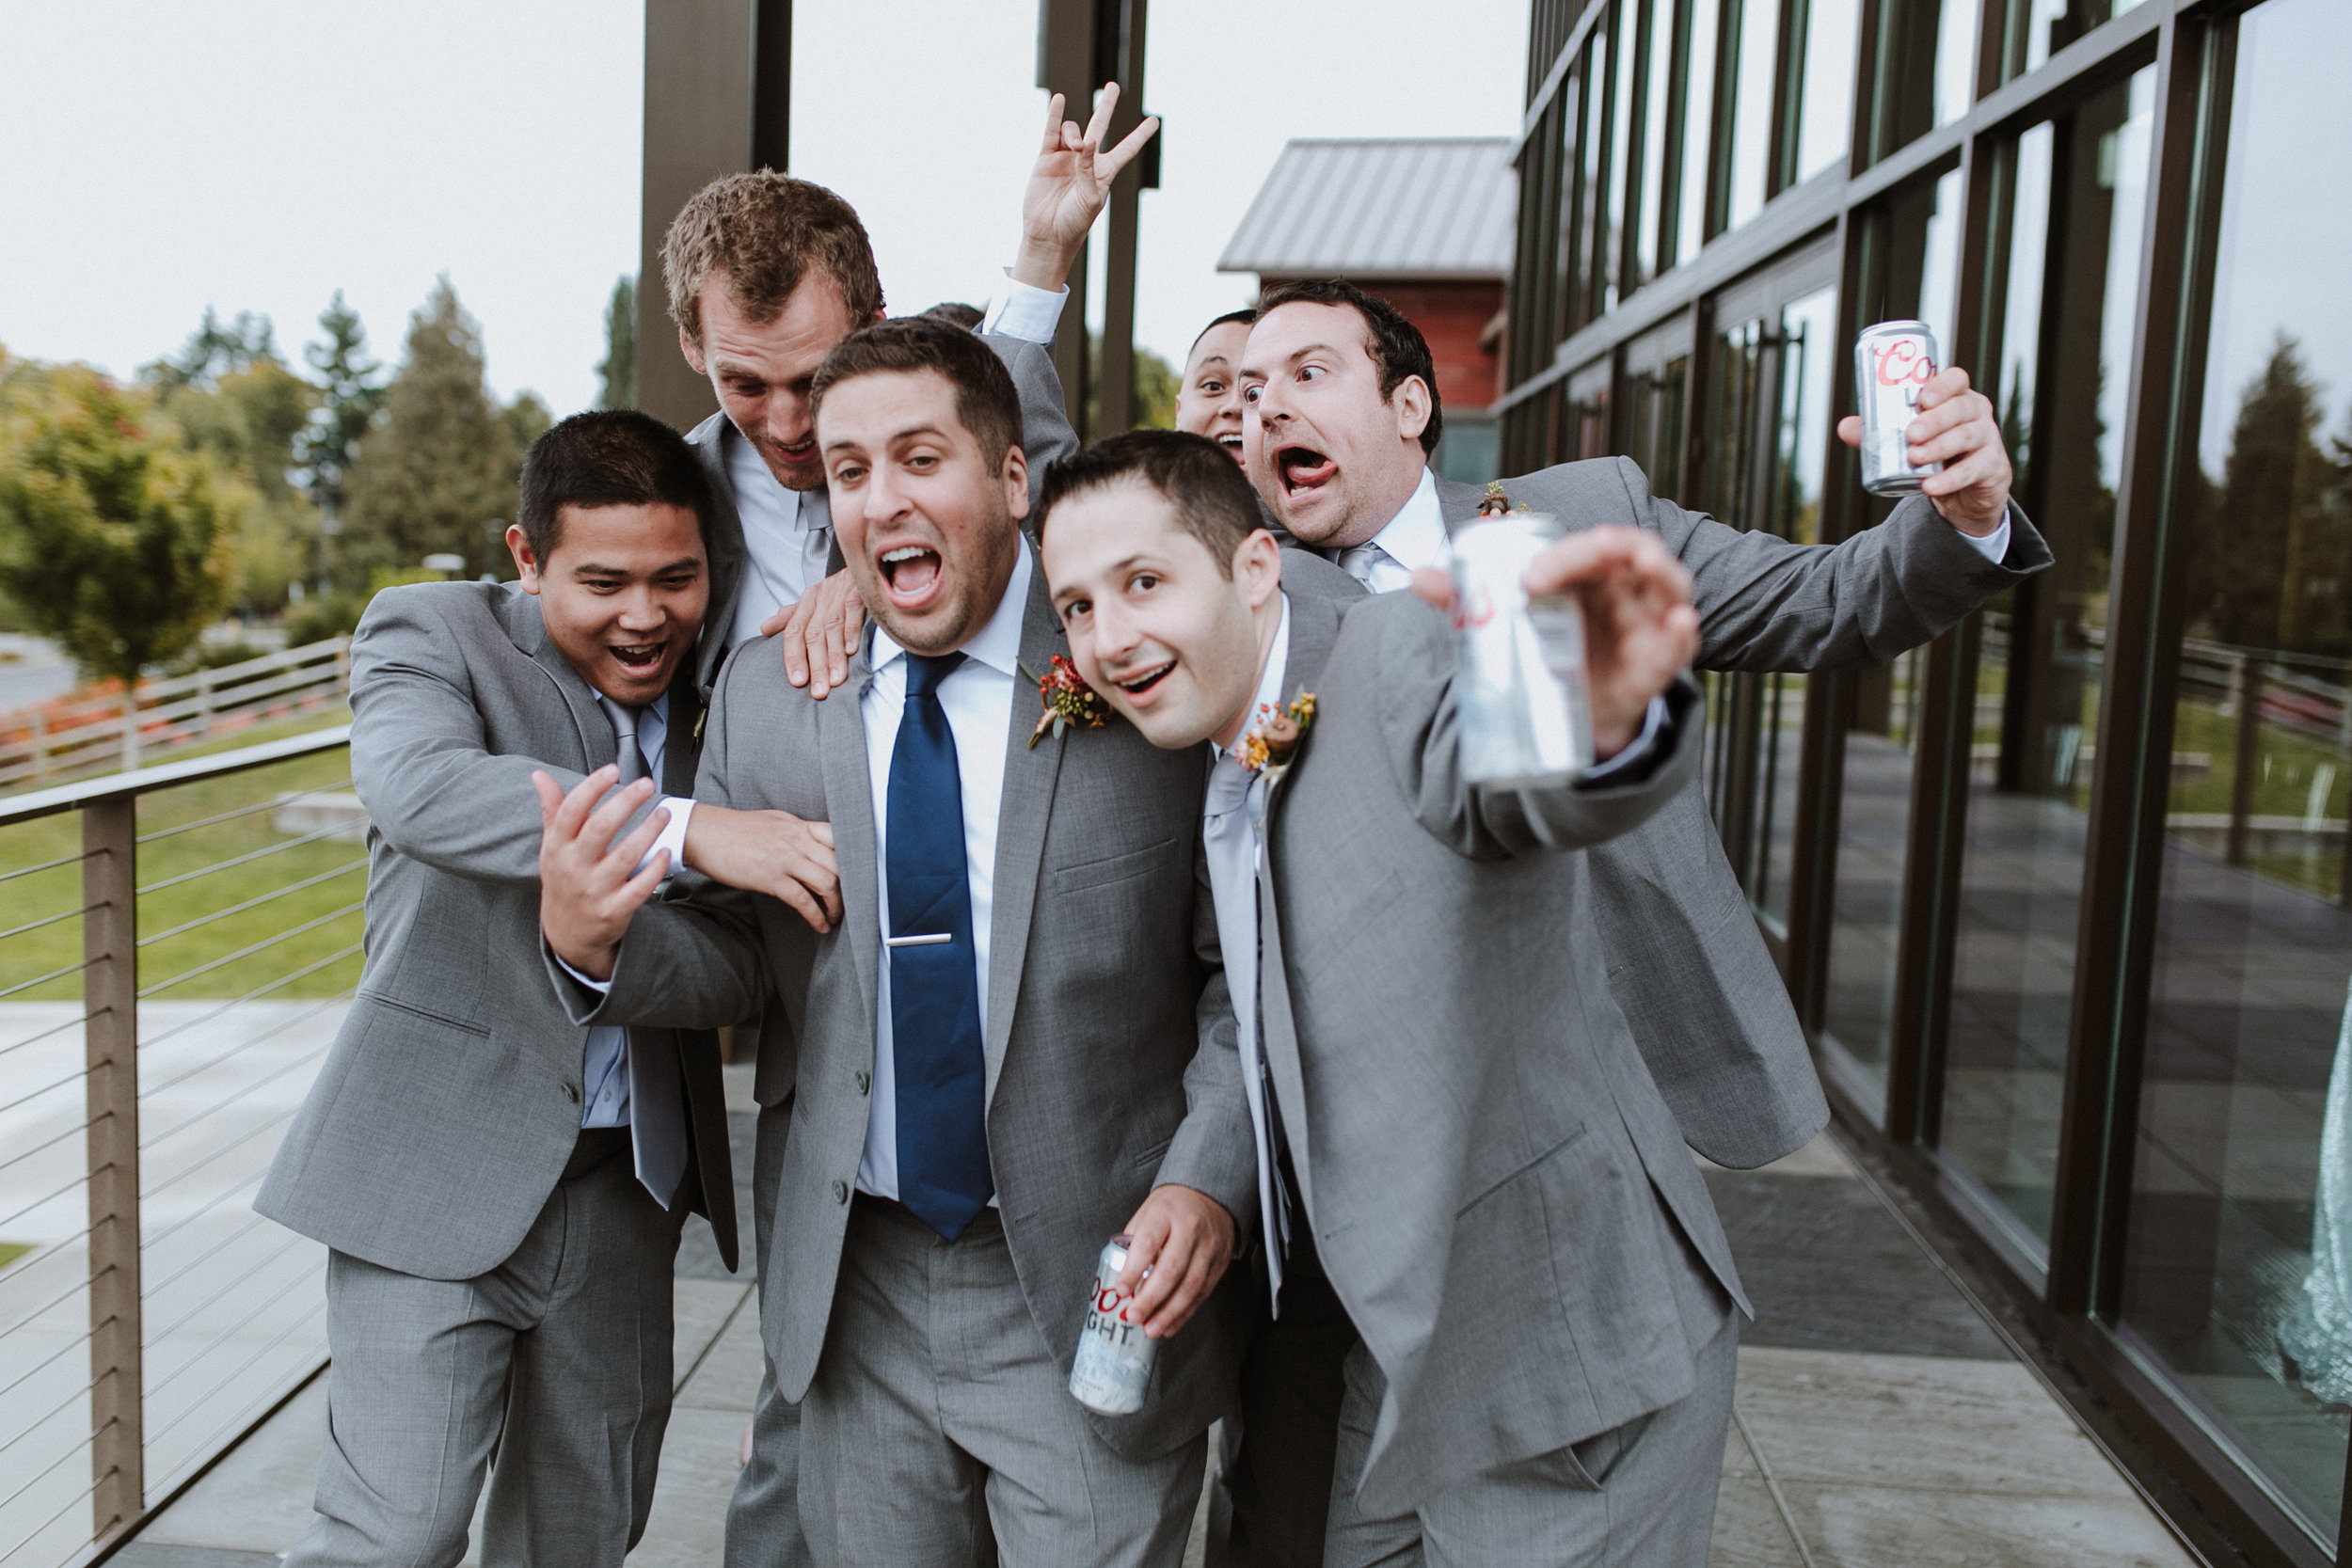 groomsmen attack groom